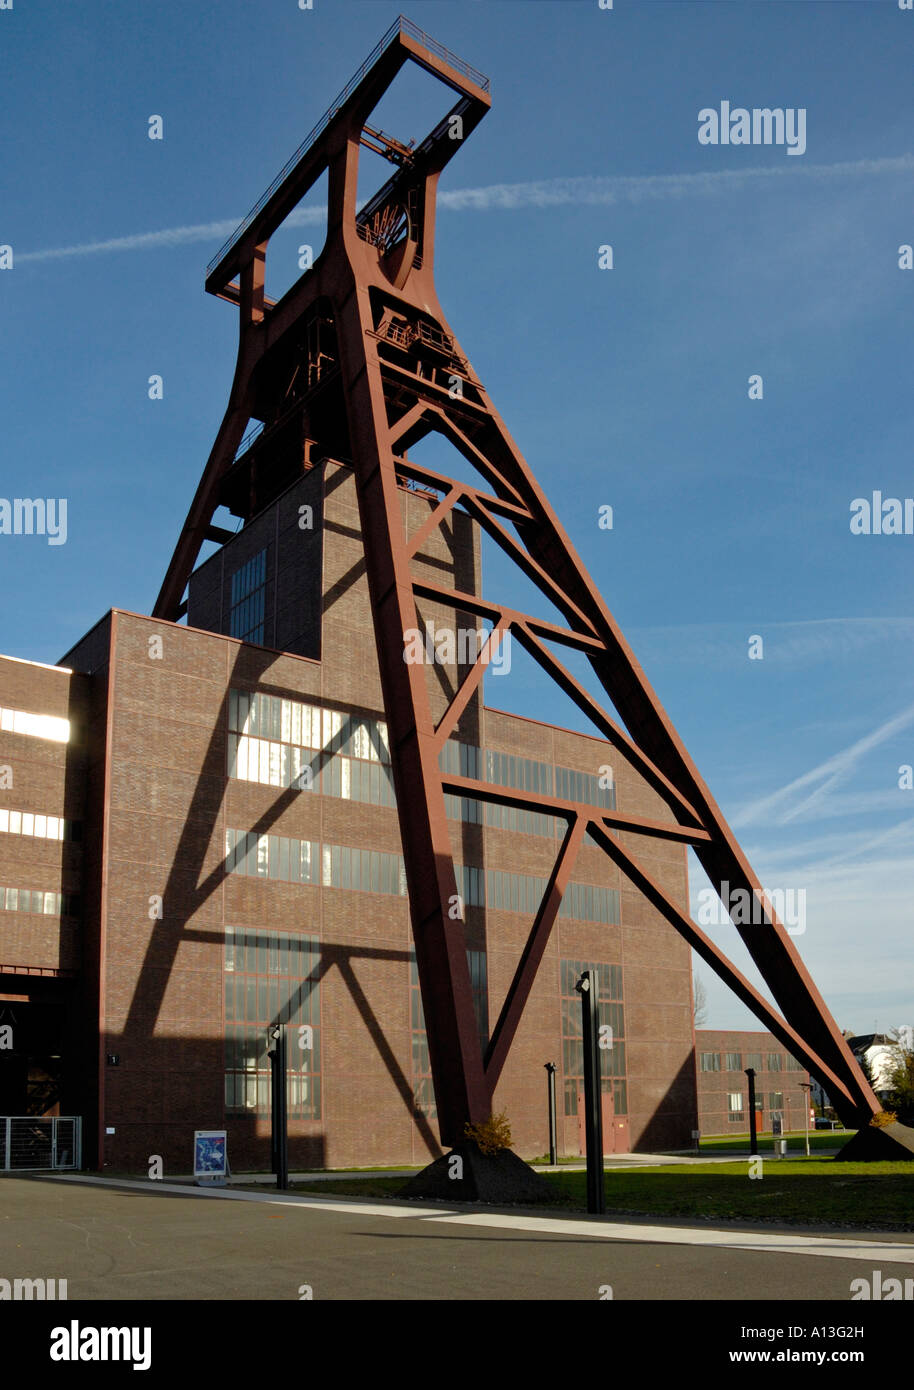 Unesco Coal Mine Zollverein, Pit XII, Essen, Germany. - Stock Image